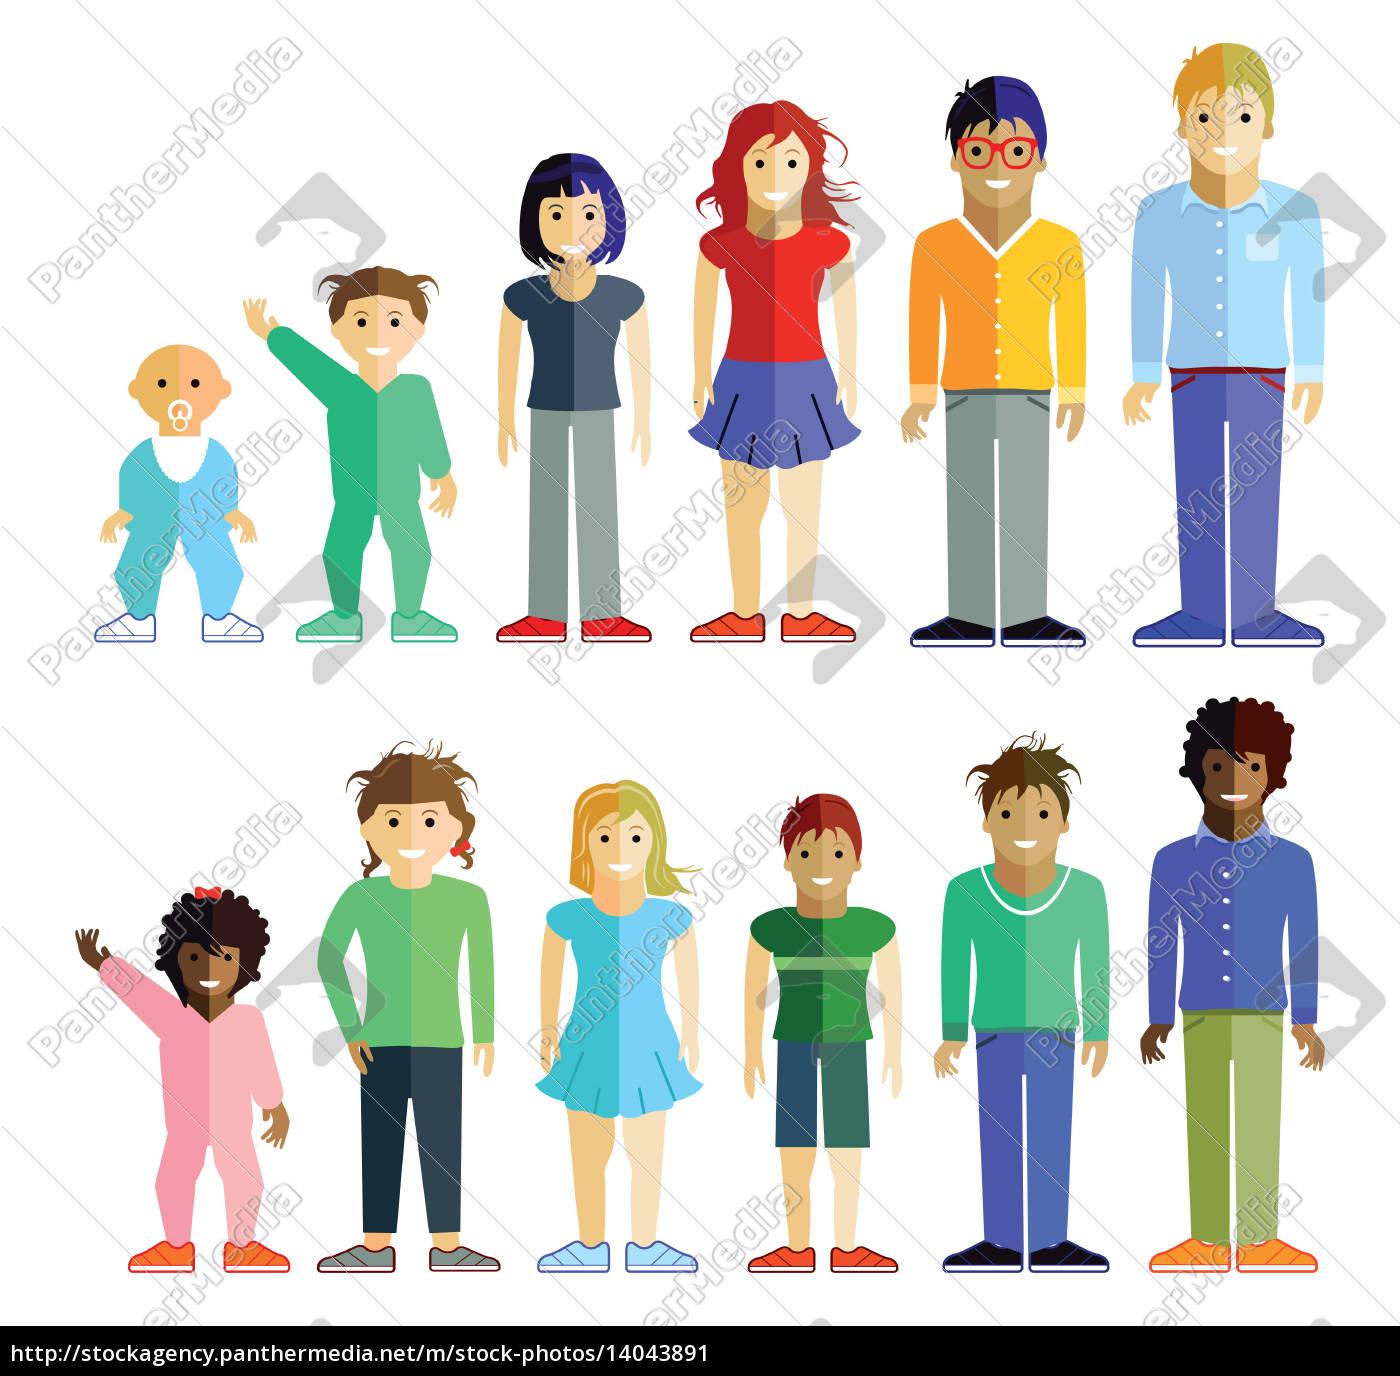 children's, group - 14043891